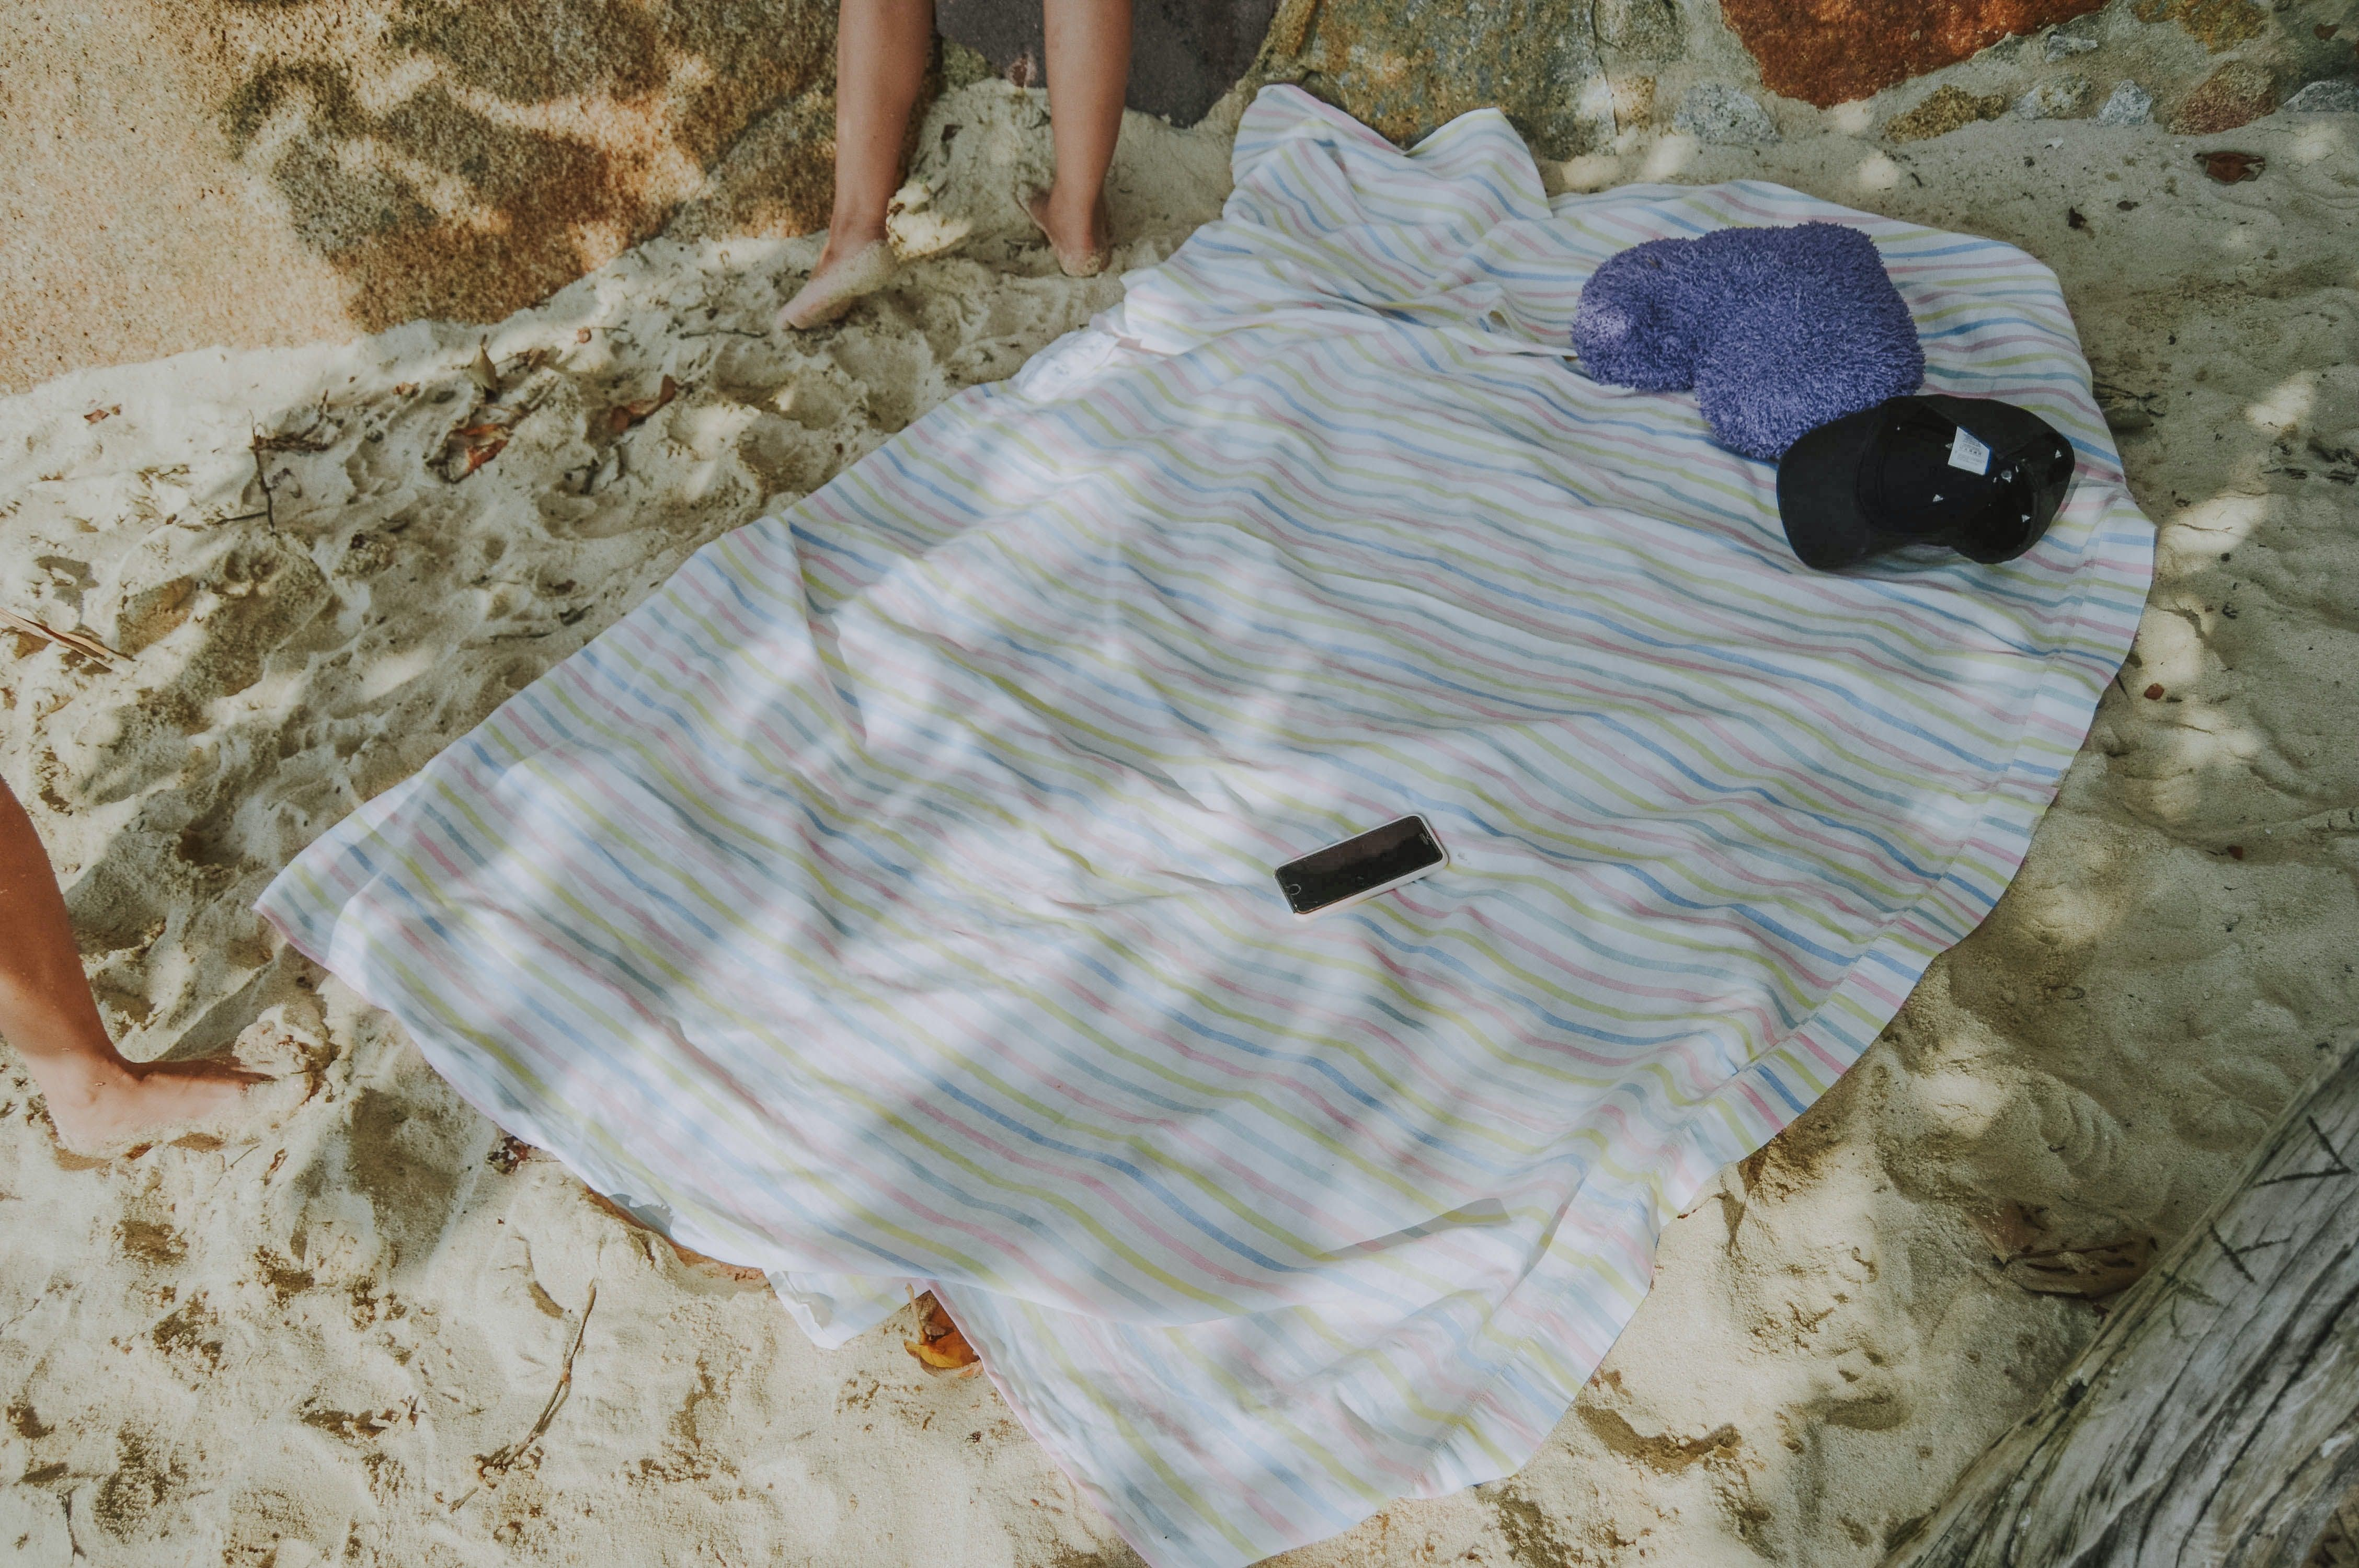 A beach blanket makes a wonderful divider between beach goers.